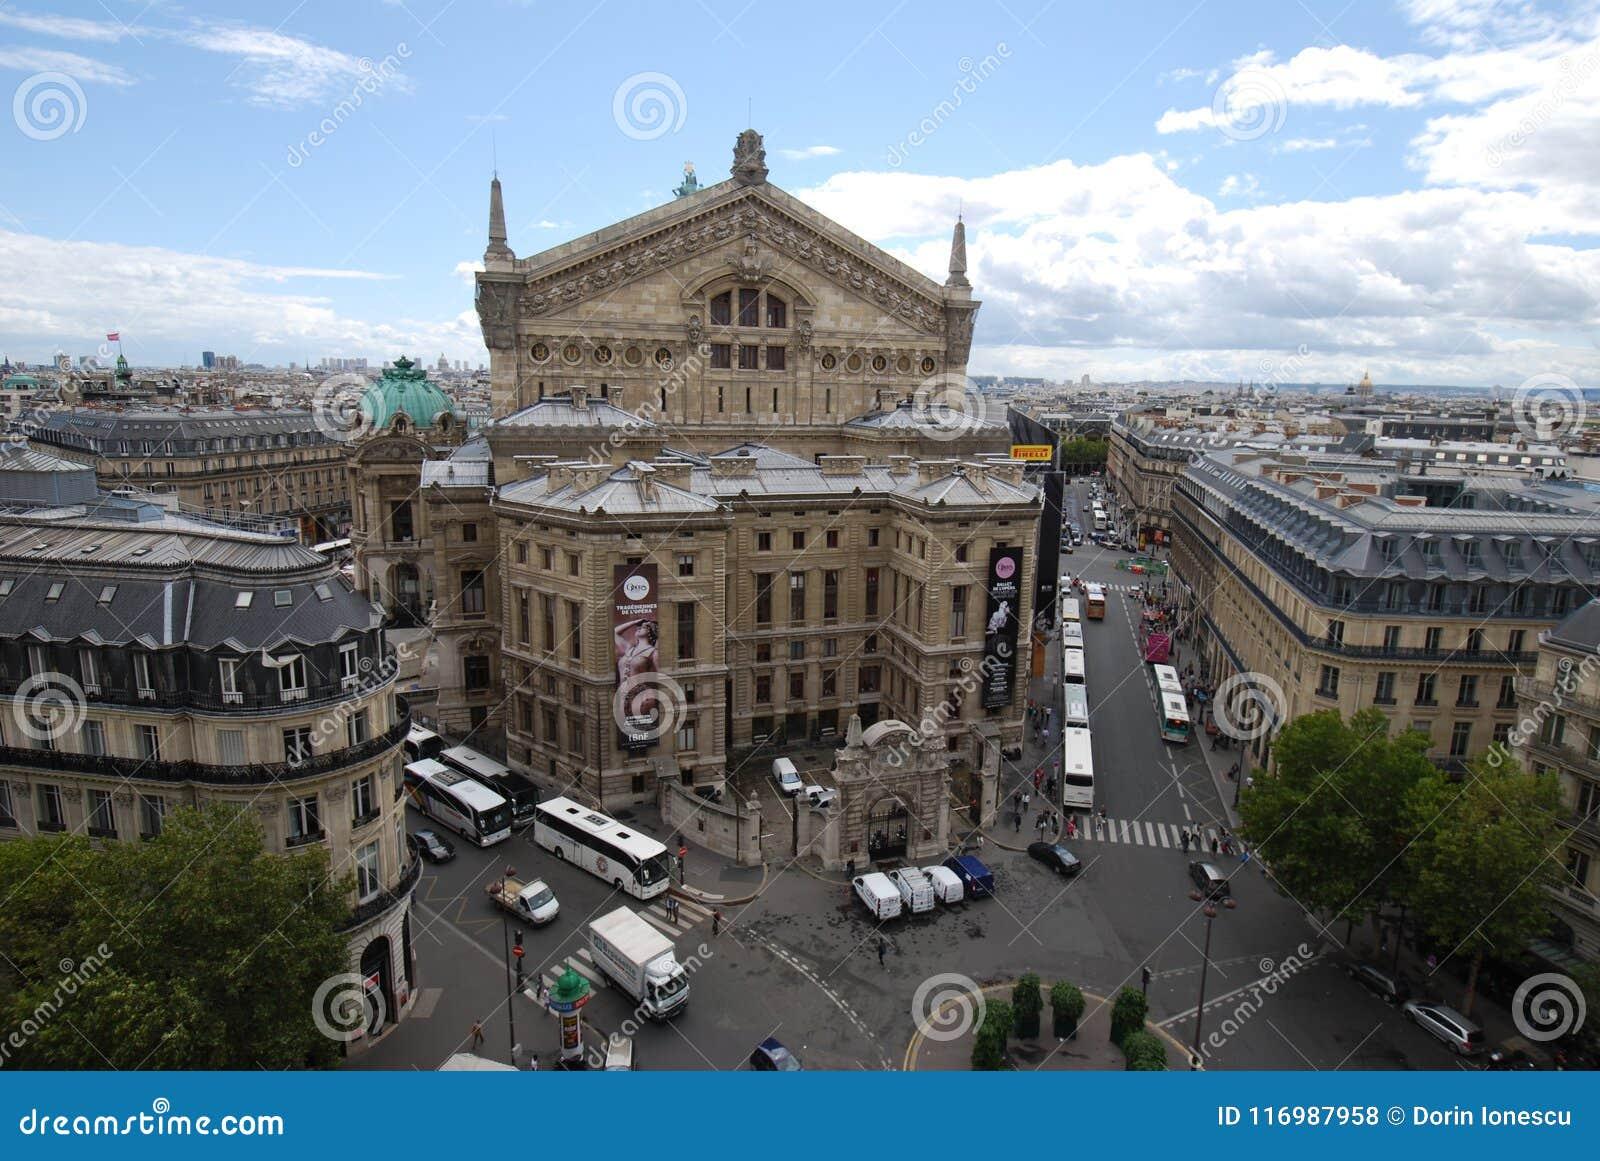 Palais Garnier, πόλη, ορόσημο, μητρόπολη, κωμόπολη